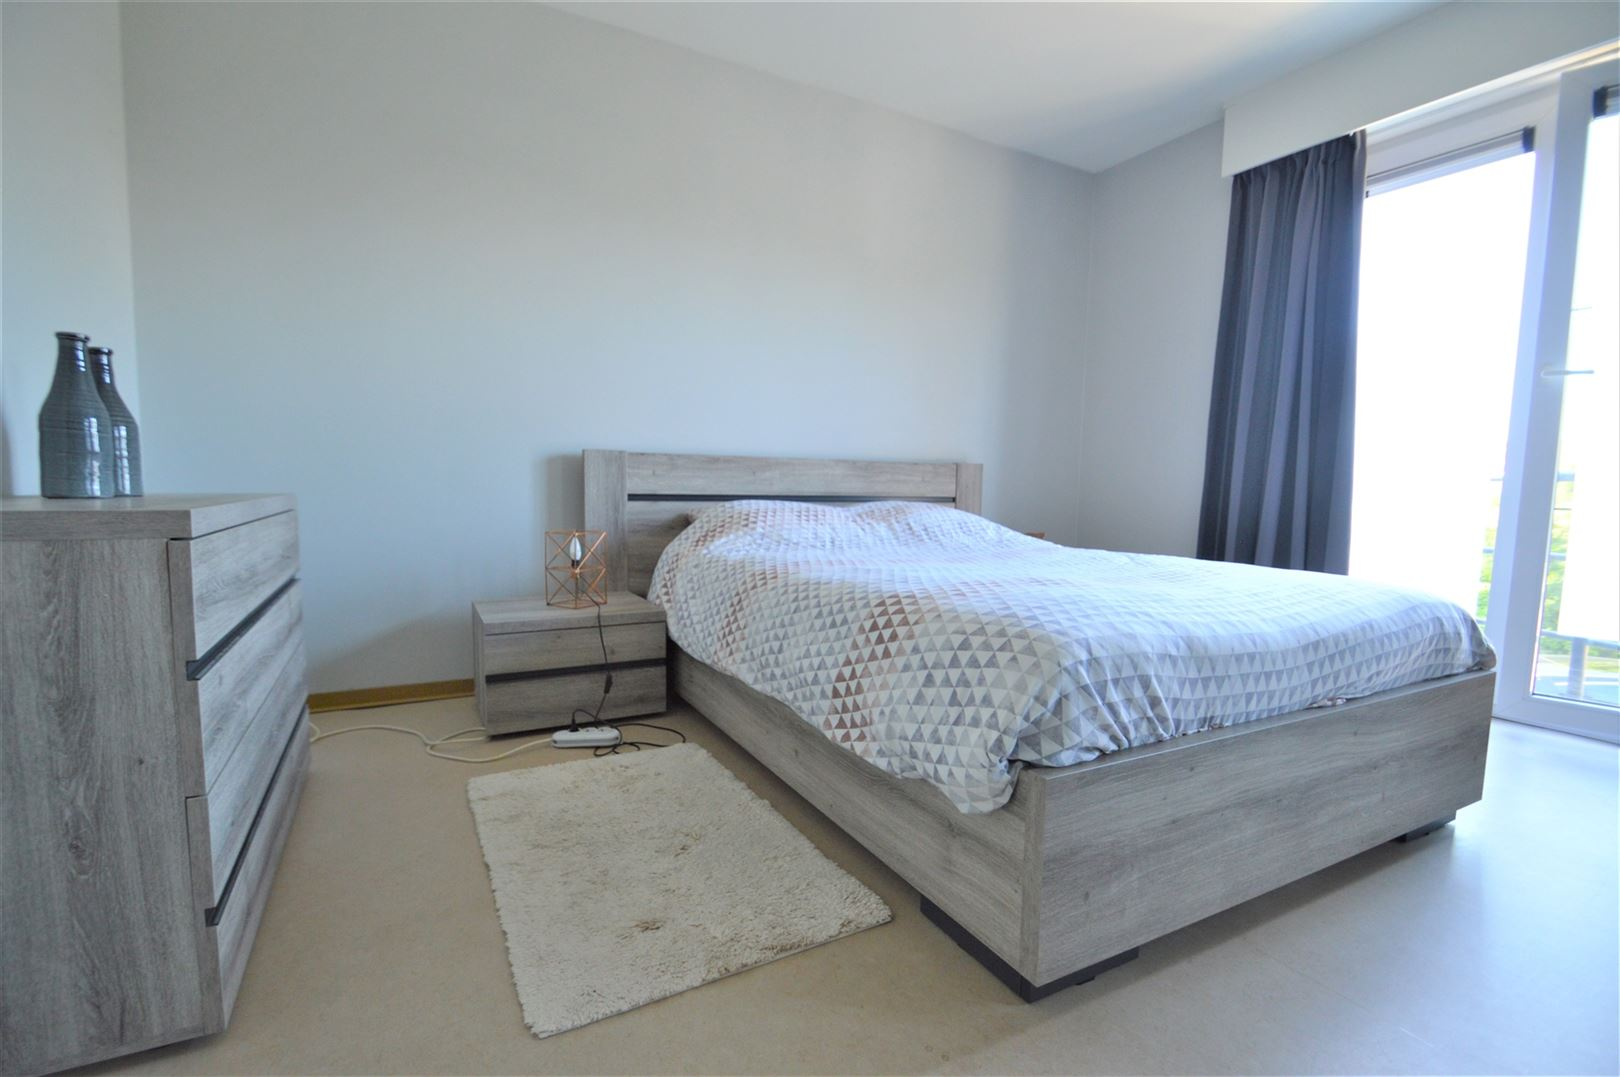 Foto 8 : Appartement te 9200 Baasrode (België) - Prijs € 630